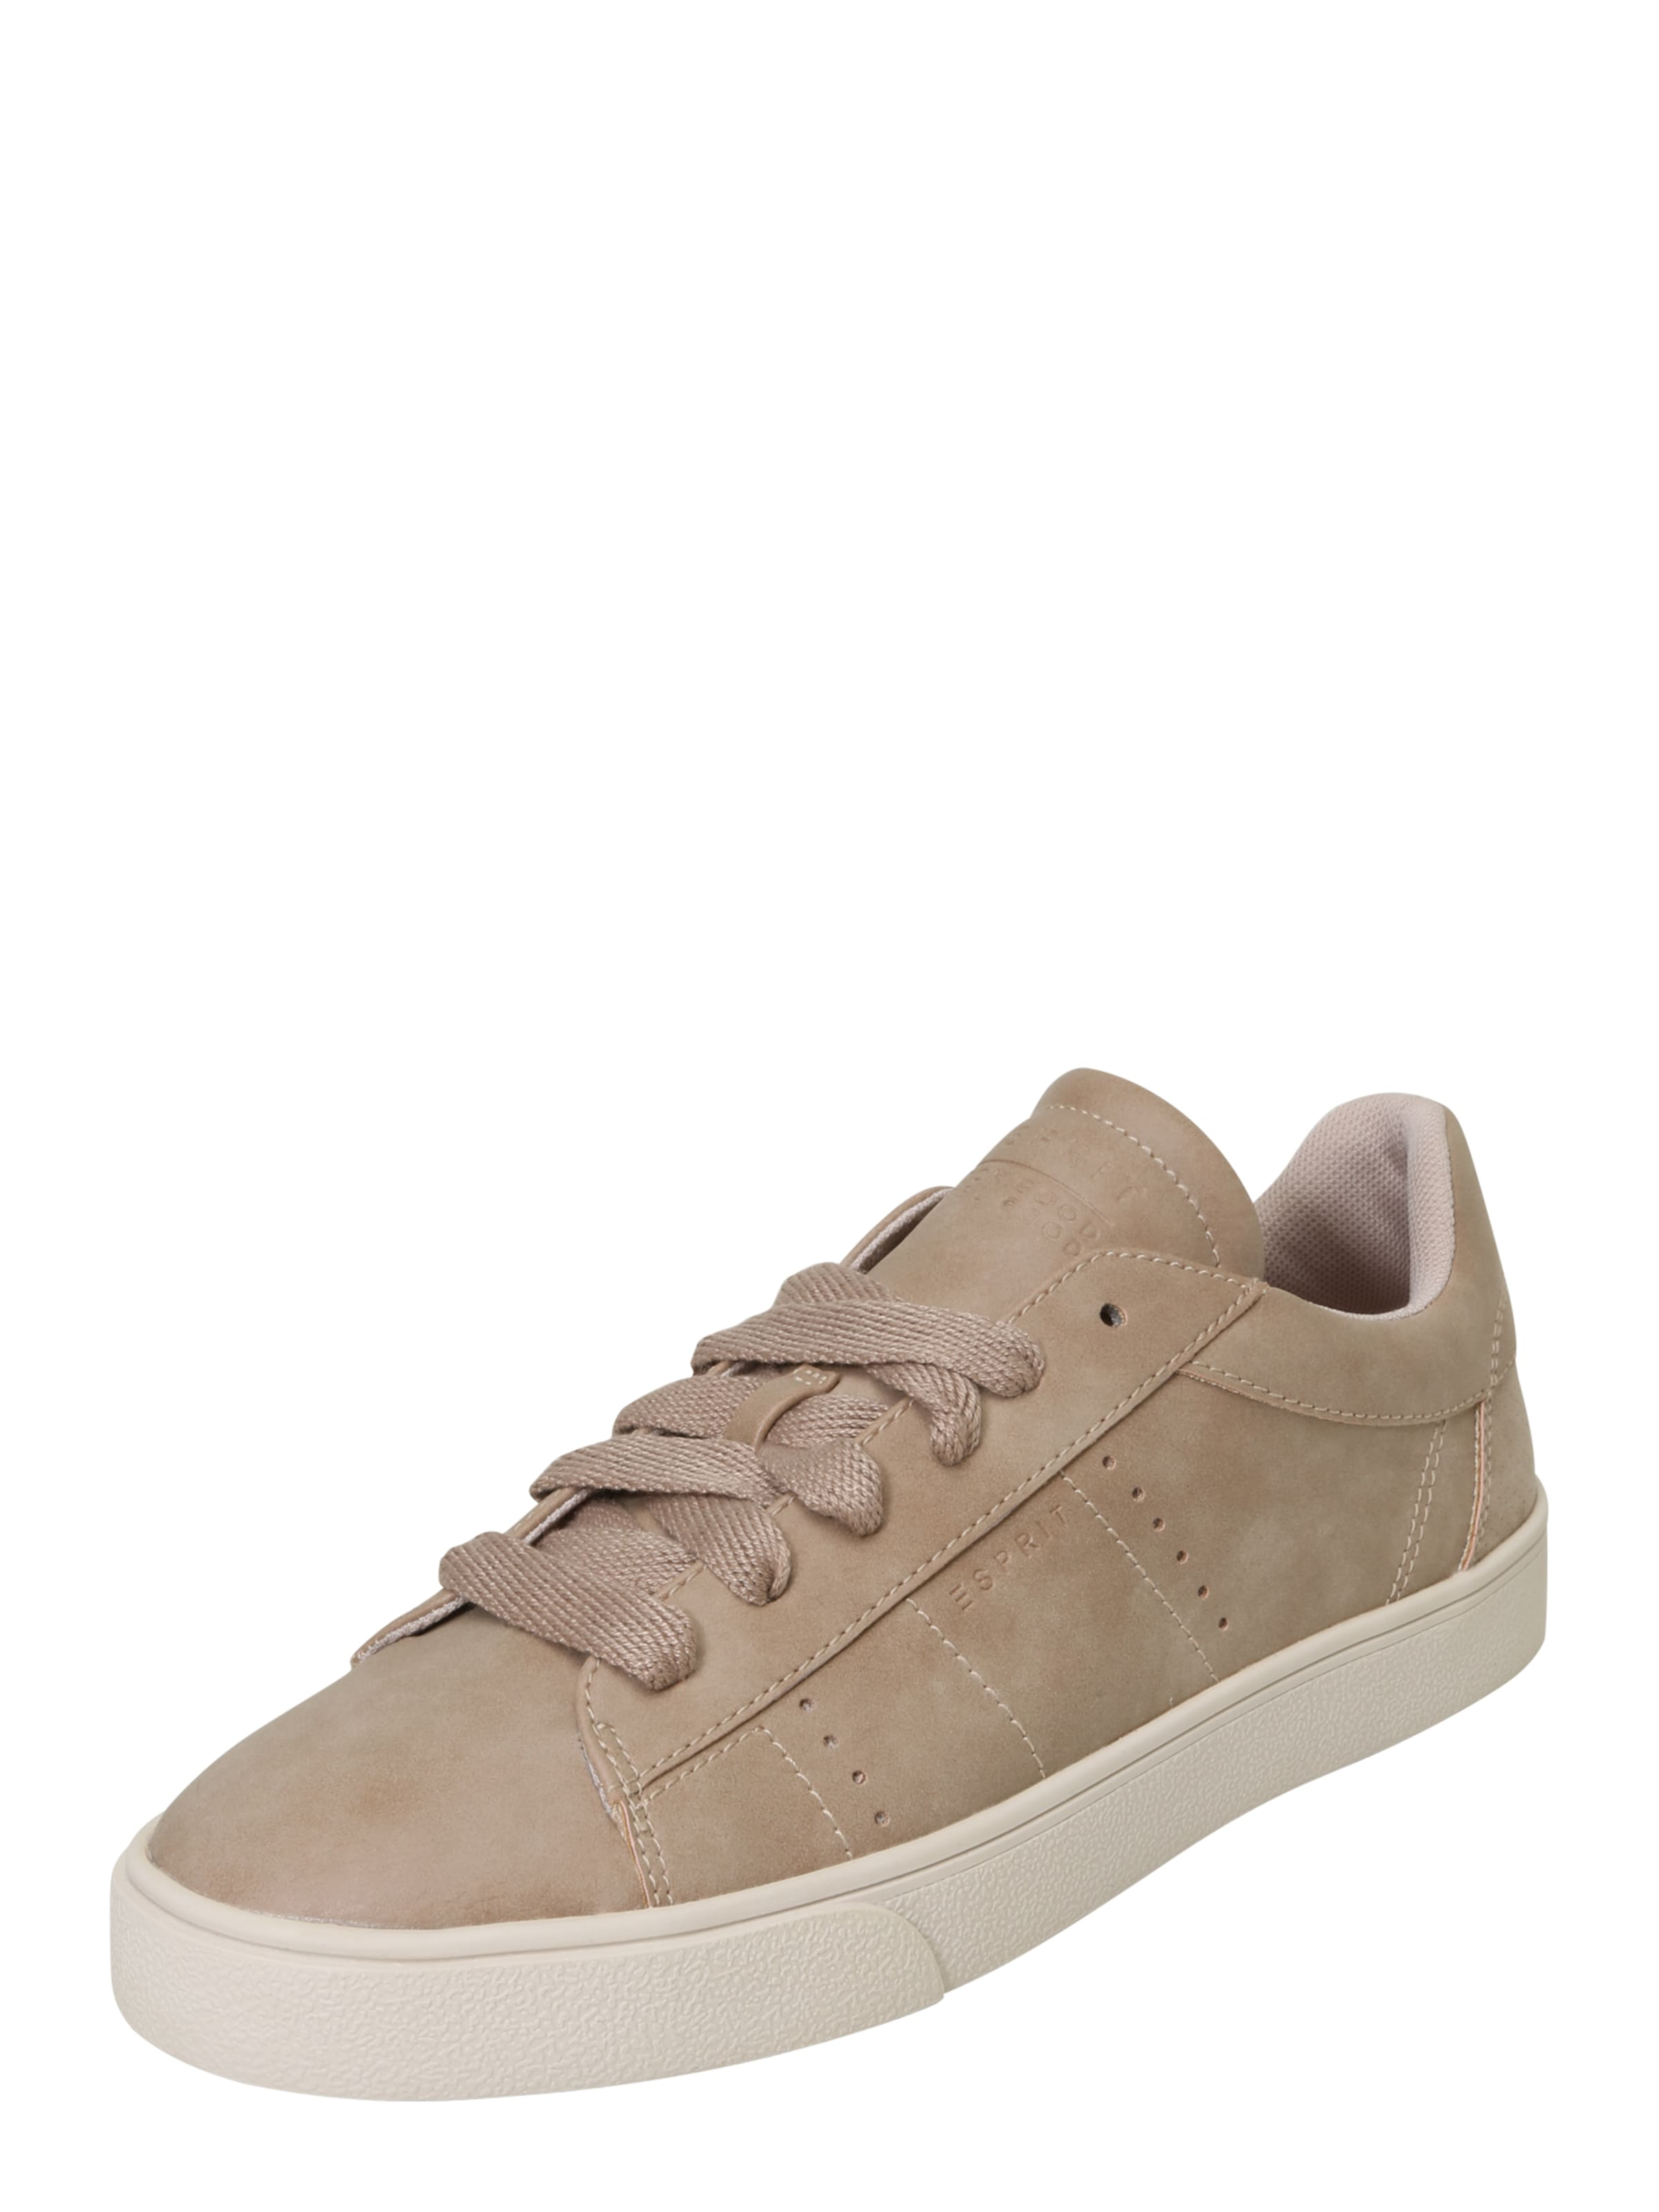 ESPRIT Sneaker  Cherry LU